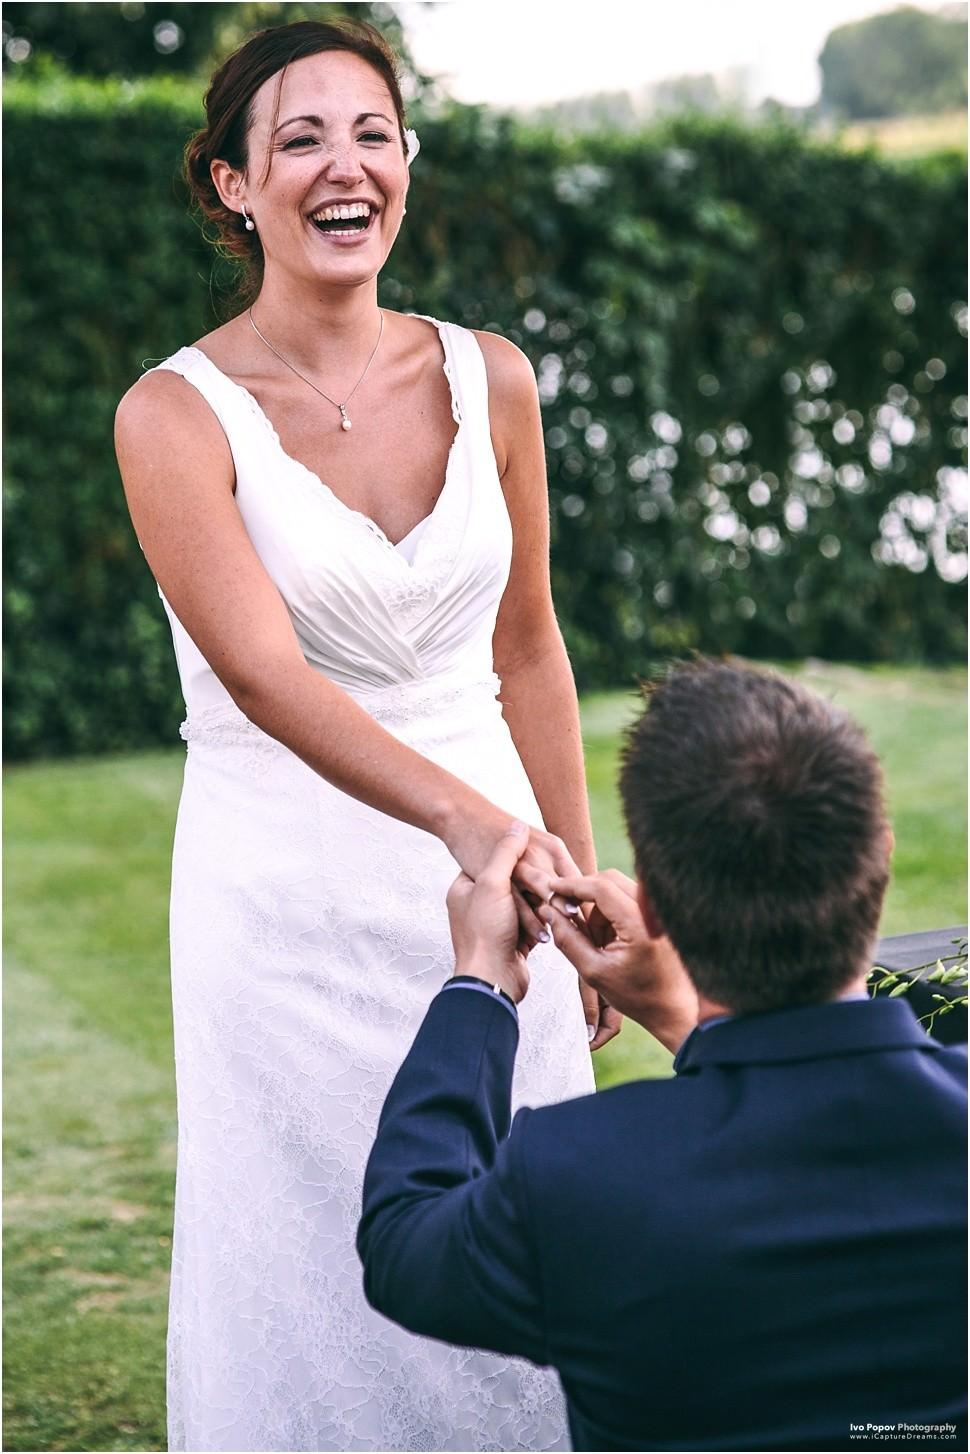 Huwelijksfotograaf Ivo Popov_3398